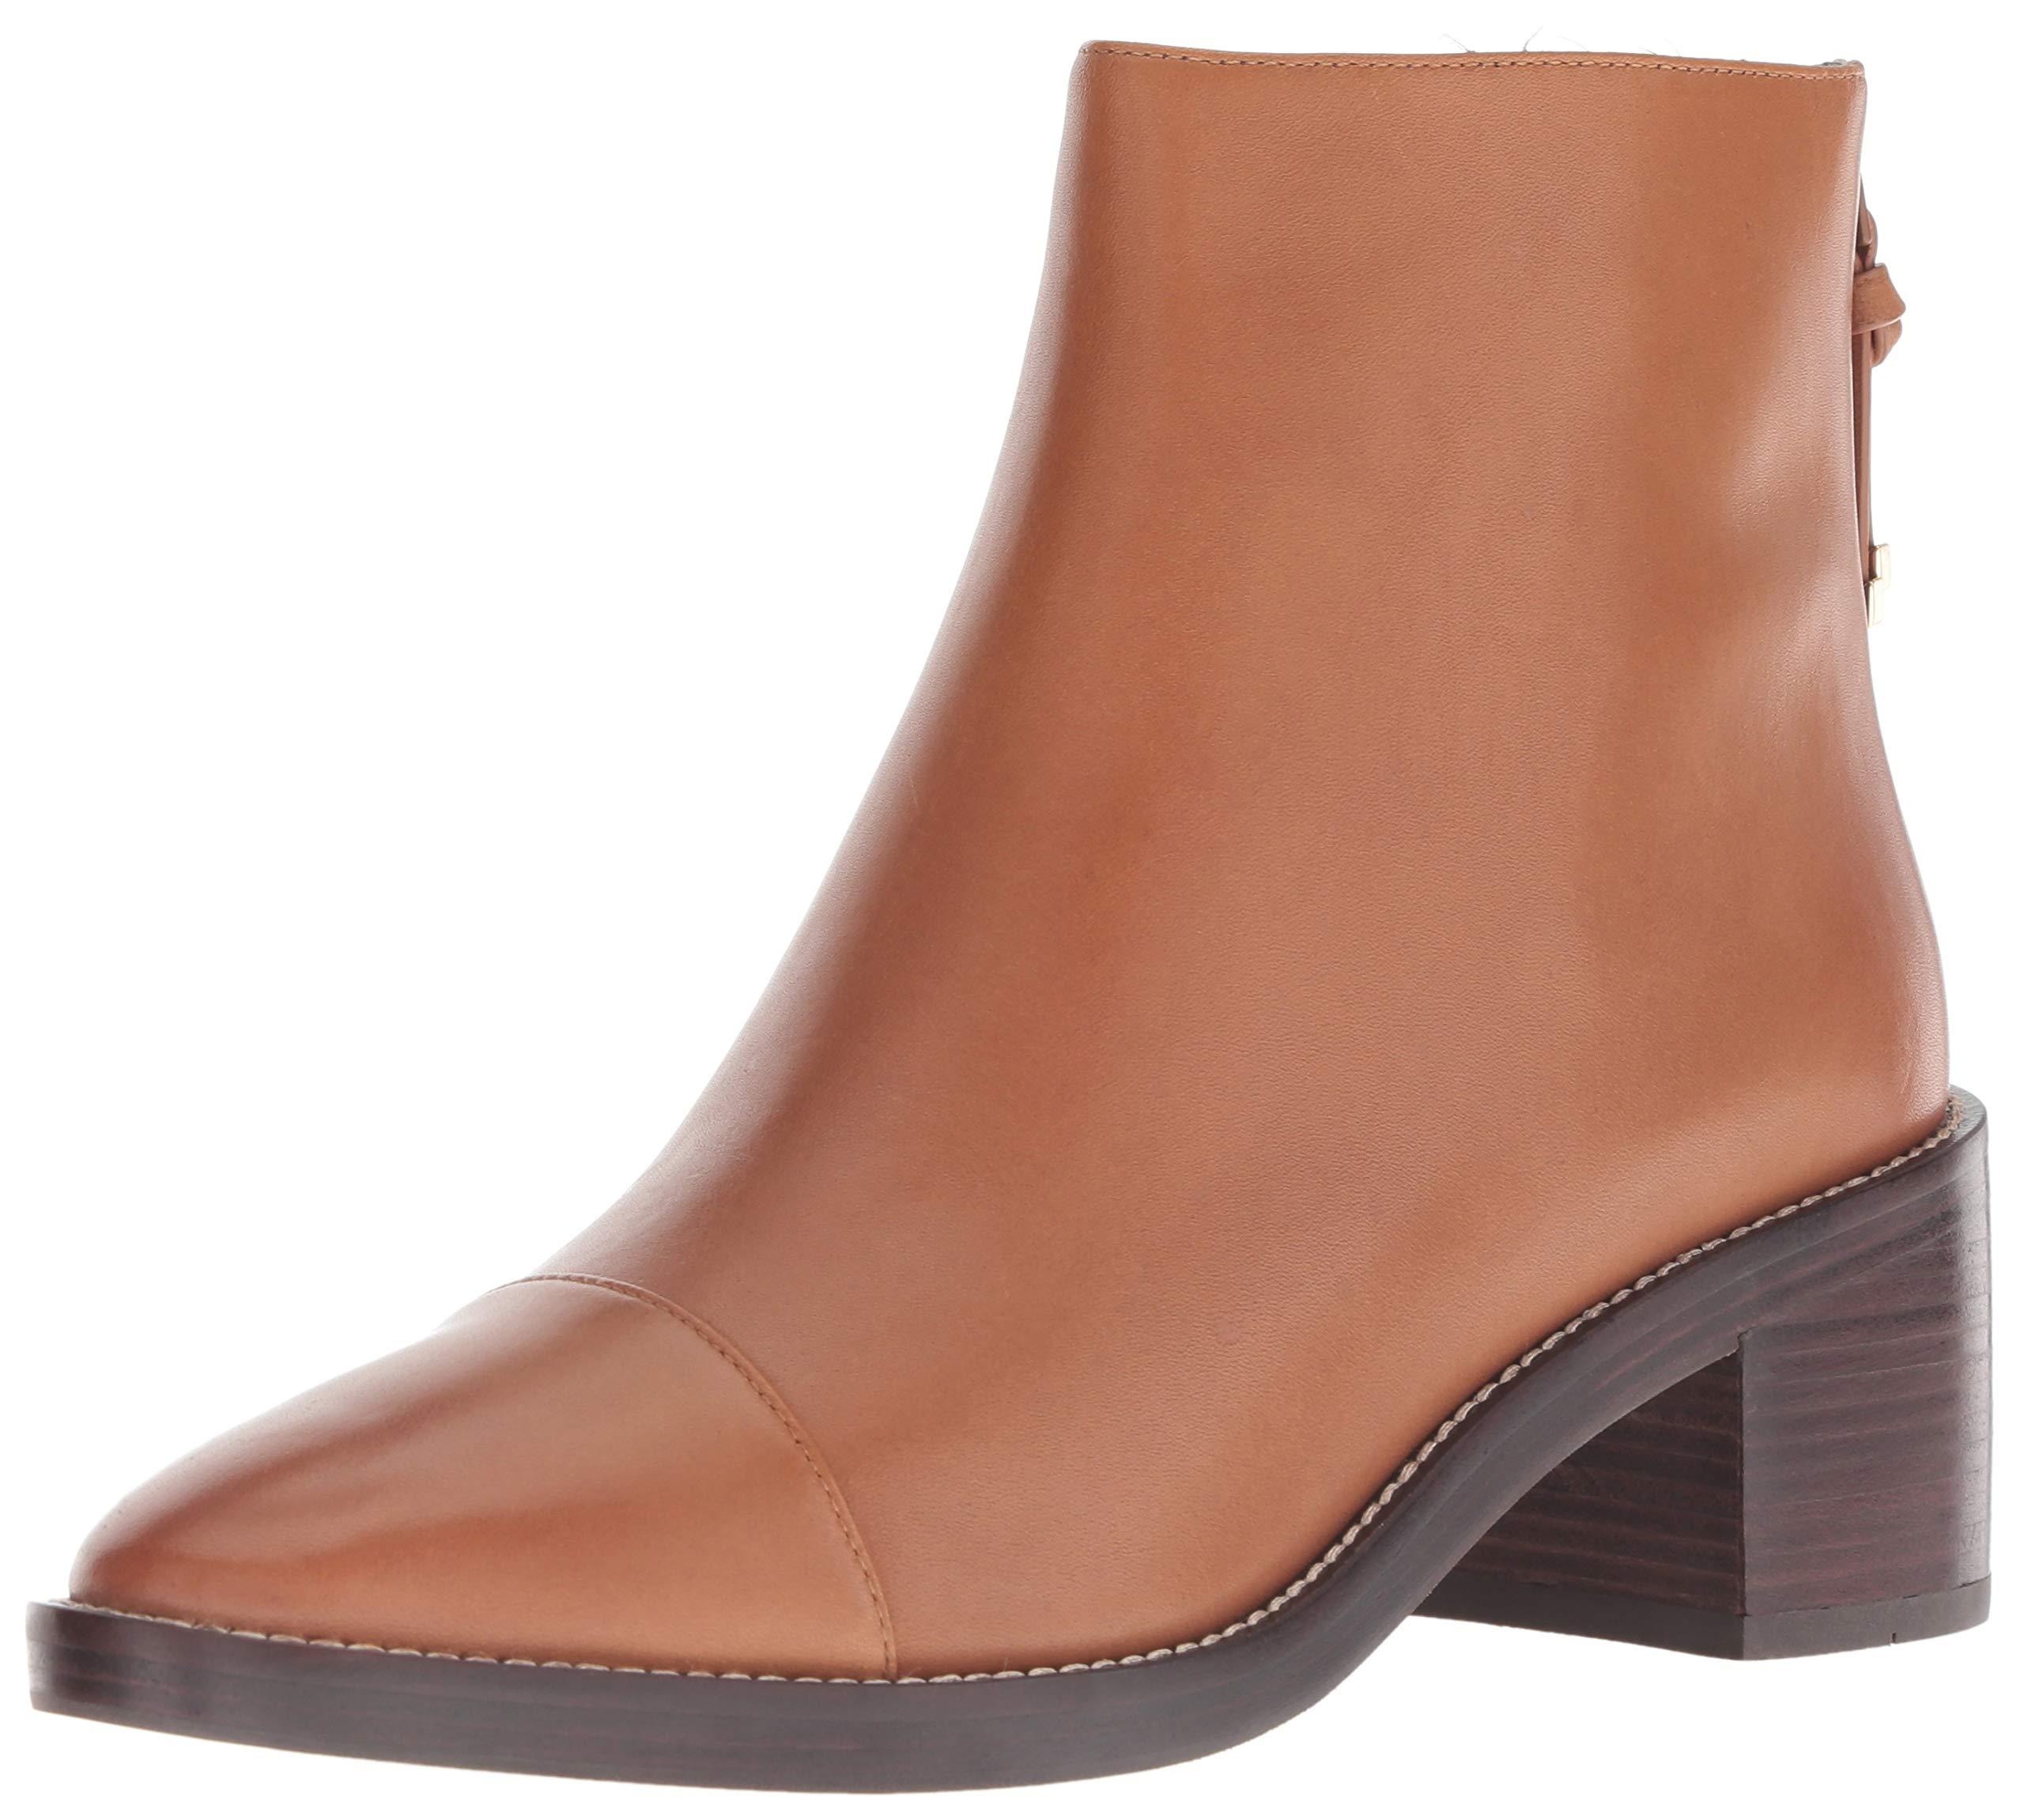 Cole Haan Women's Winne Grand Bootie Ankle Boot, British TAN Waterproof Leather, 9.5 B US by Cole Haan